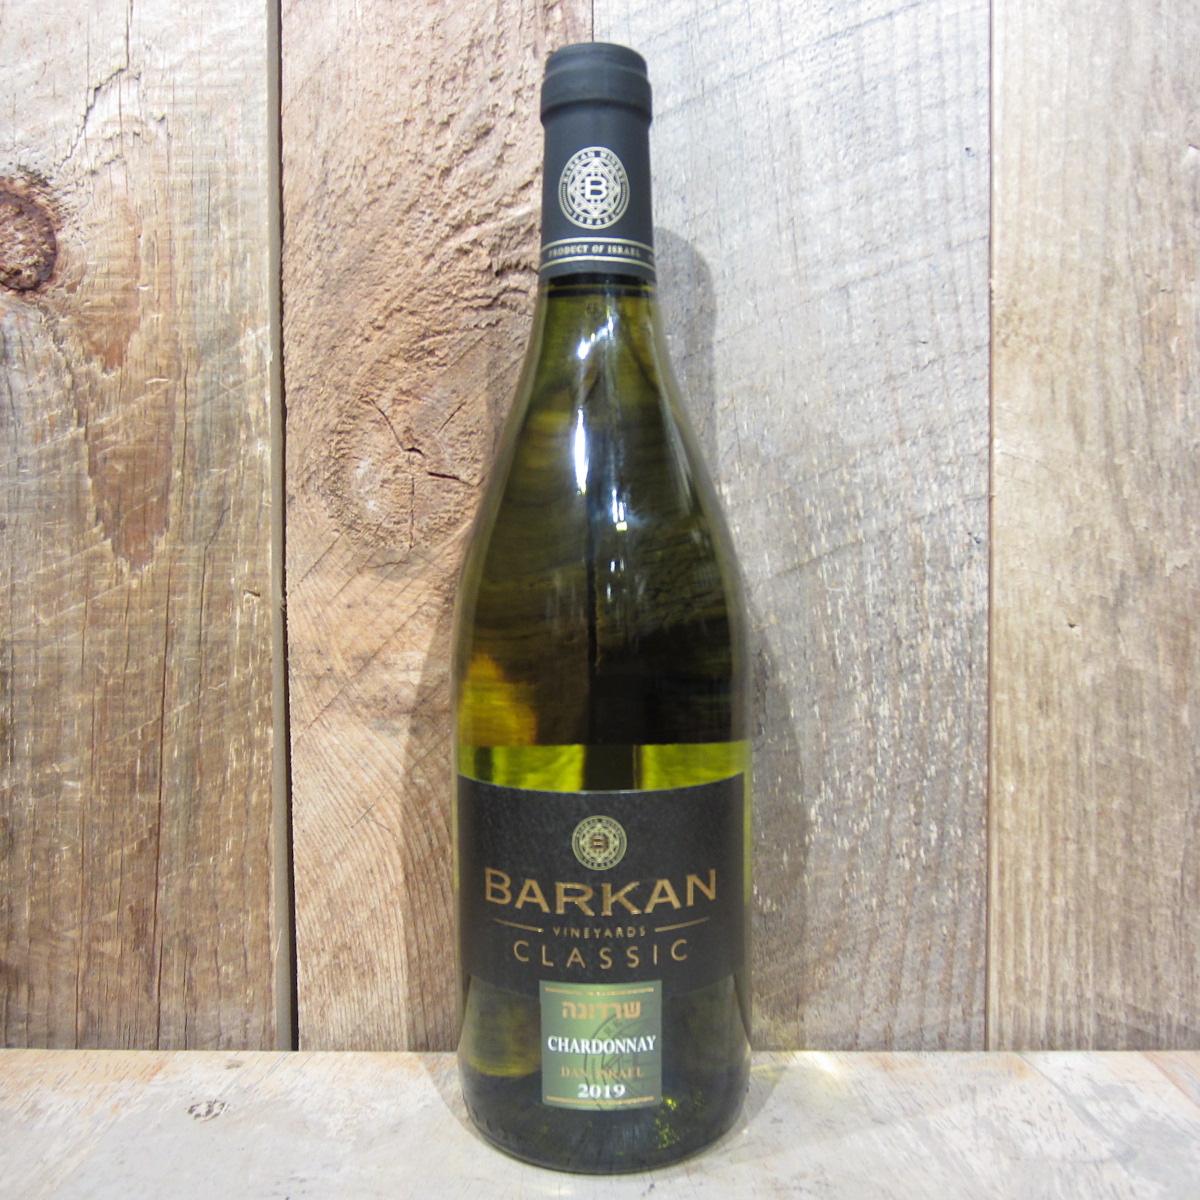 Barkan Classic Chardonnay 750ml